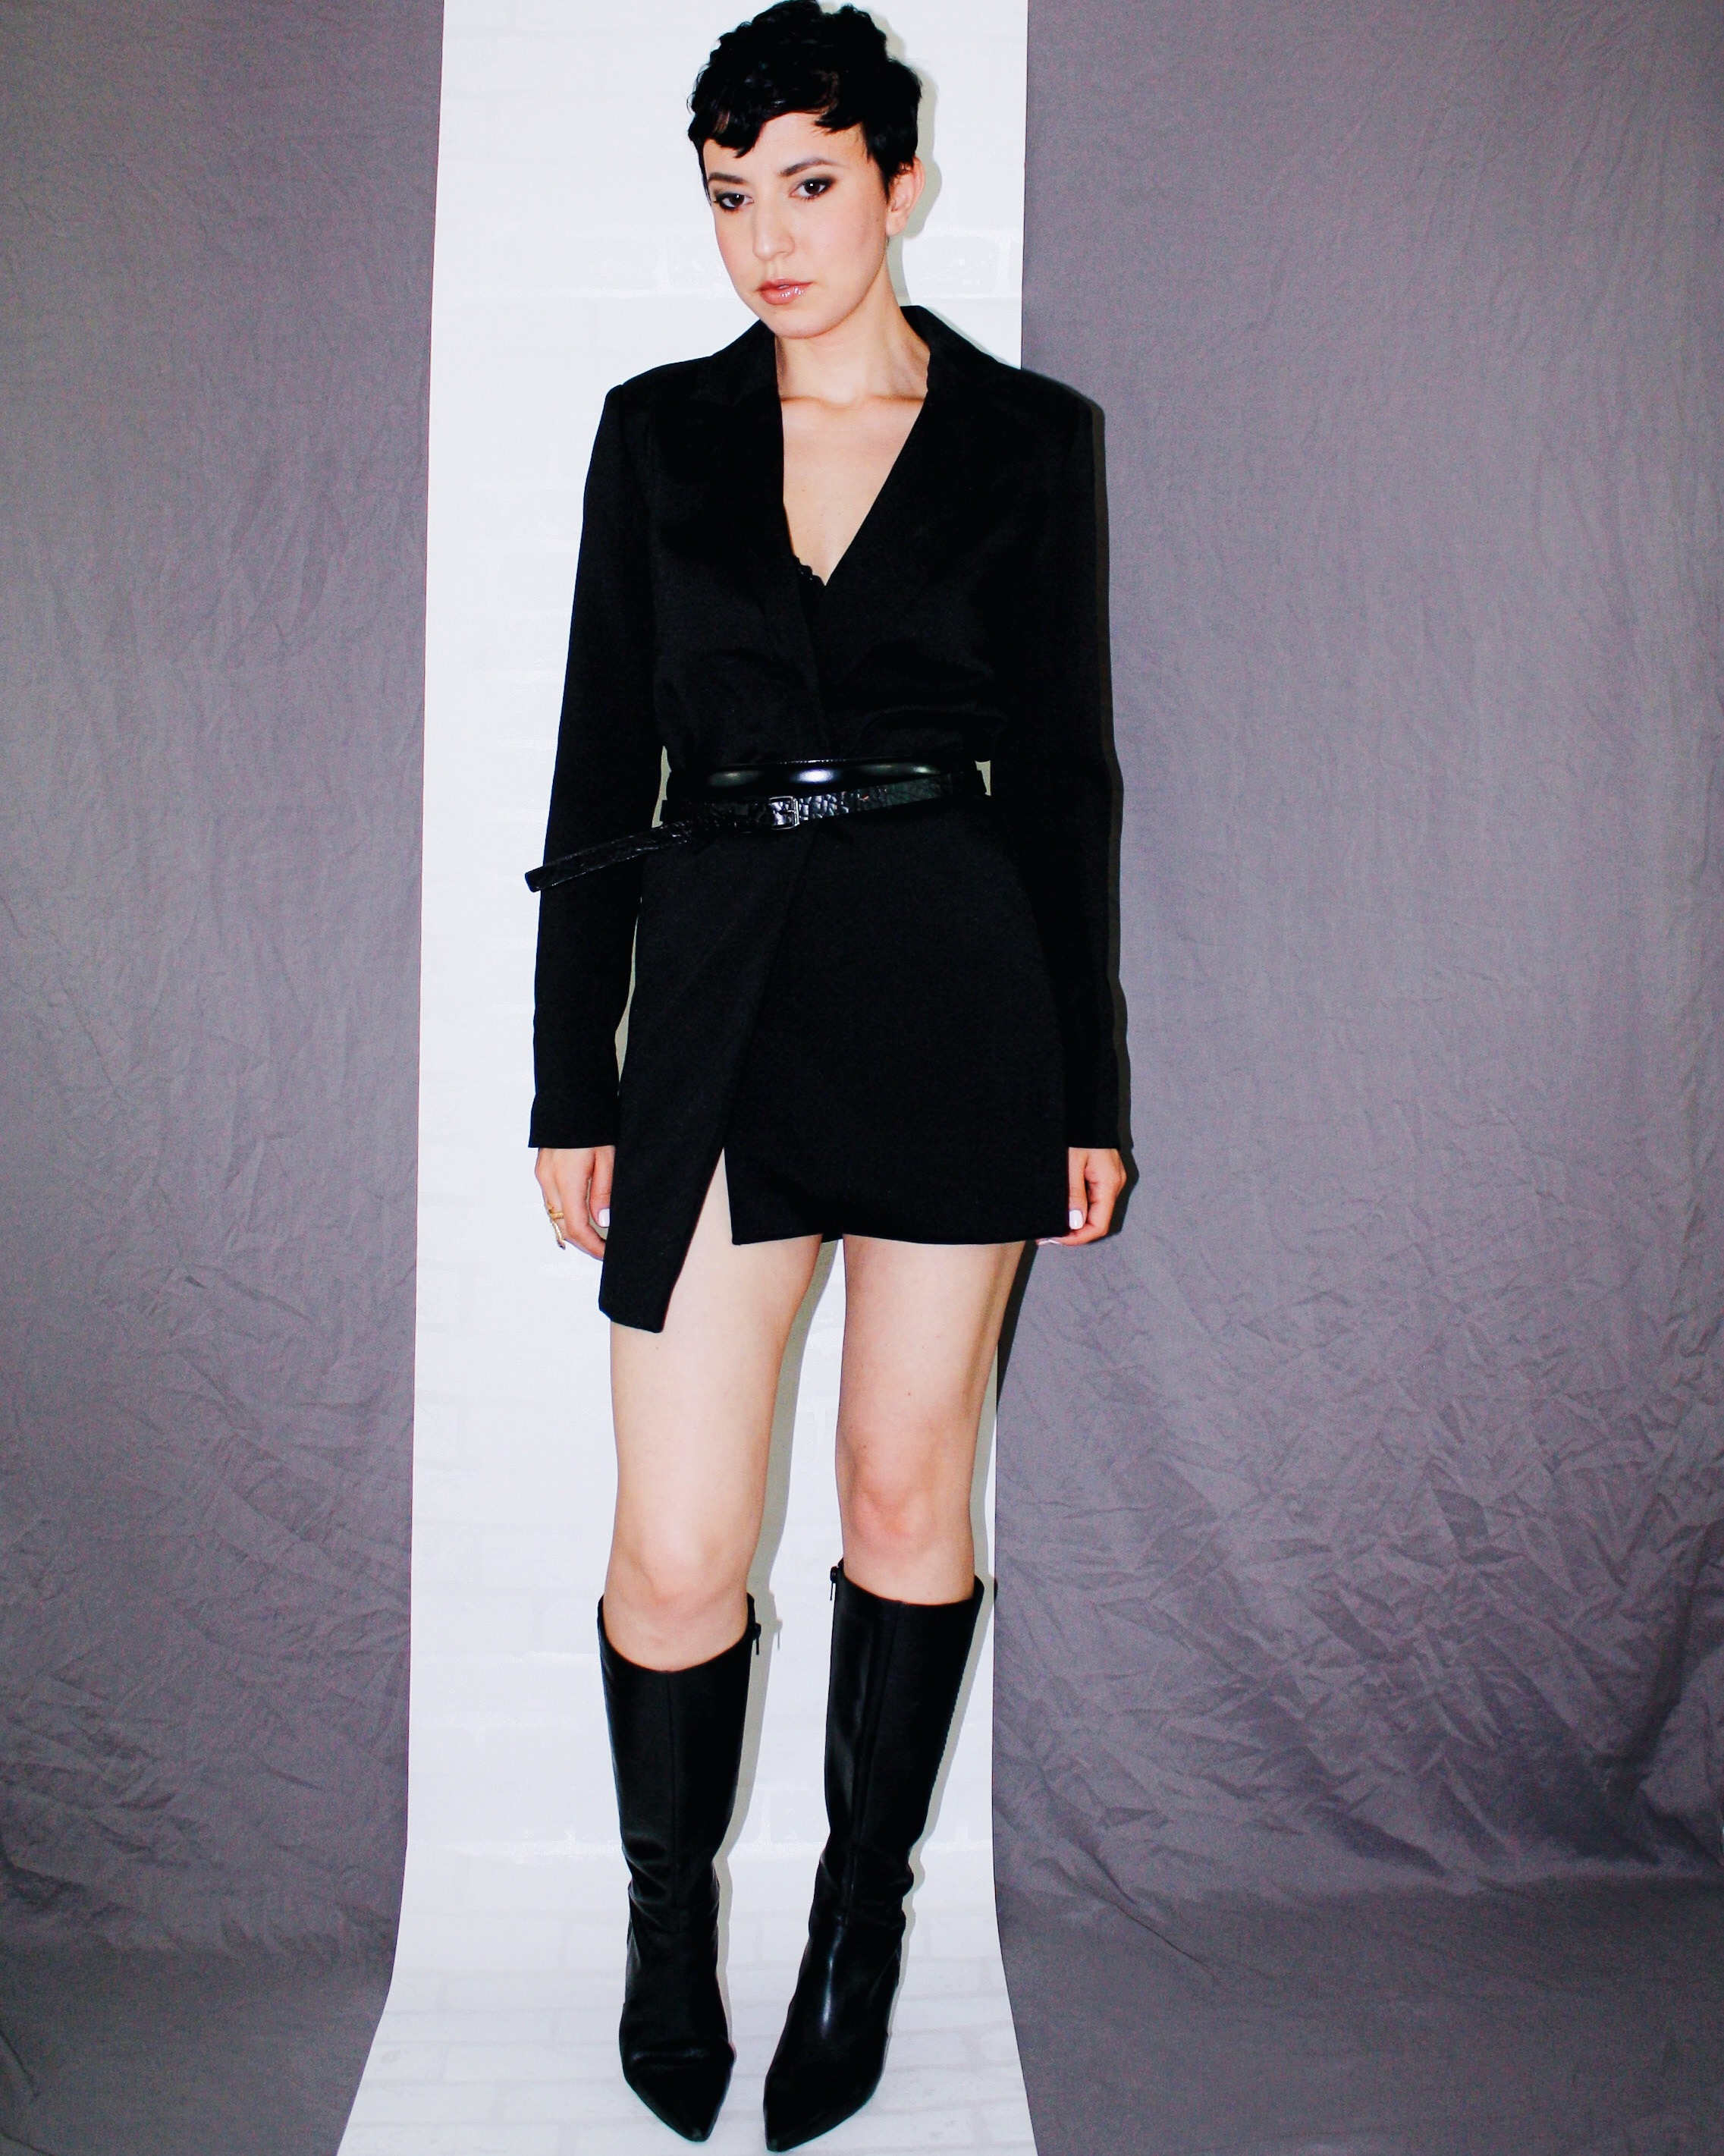 fall is here boots leather helmut lang blazer dress belts black 3